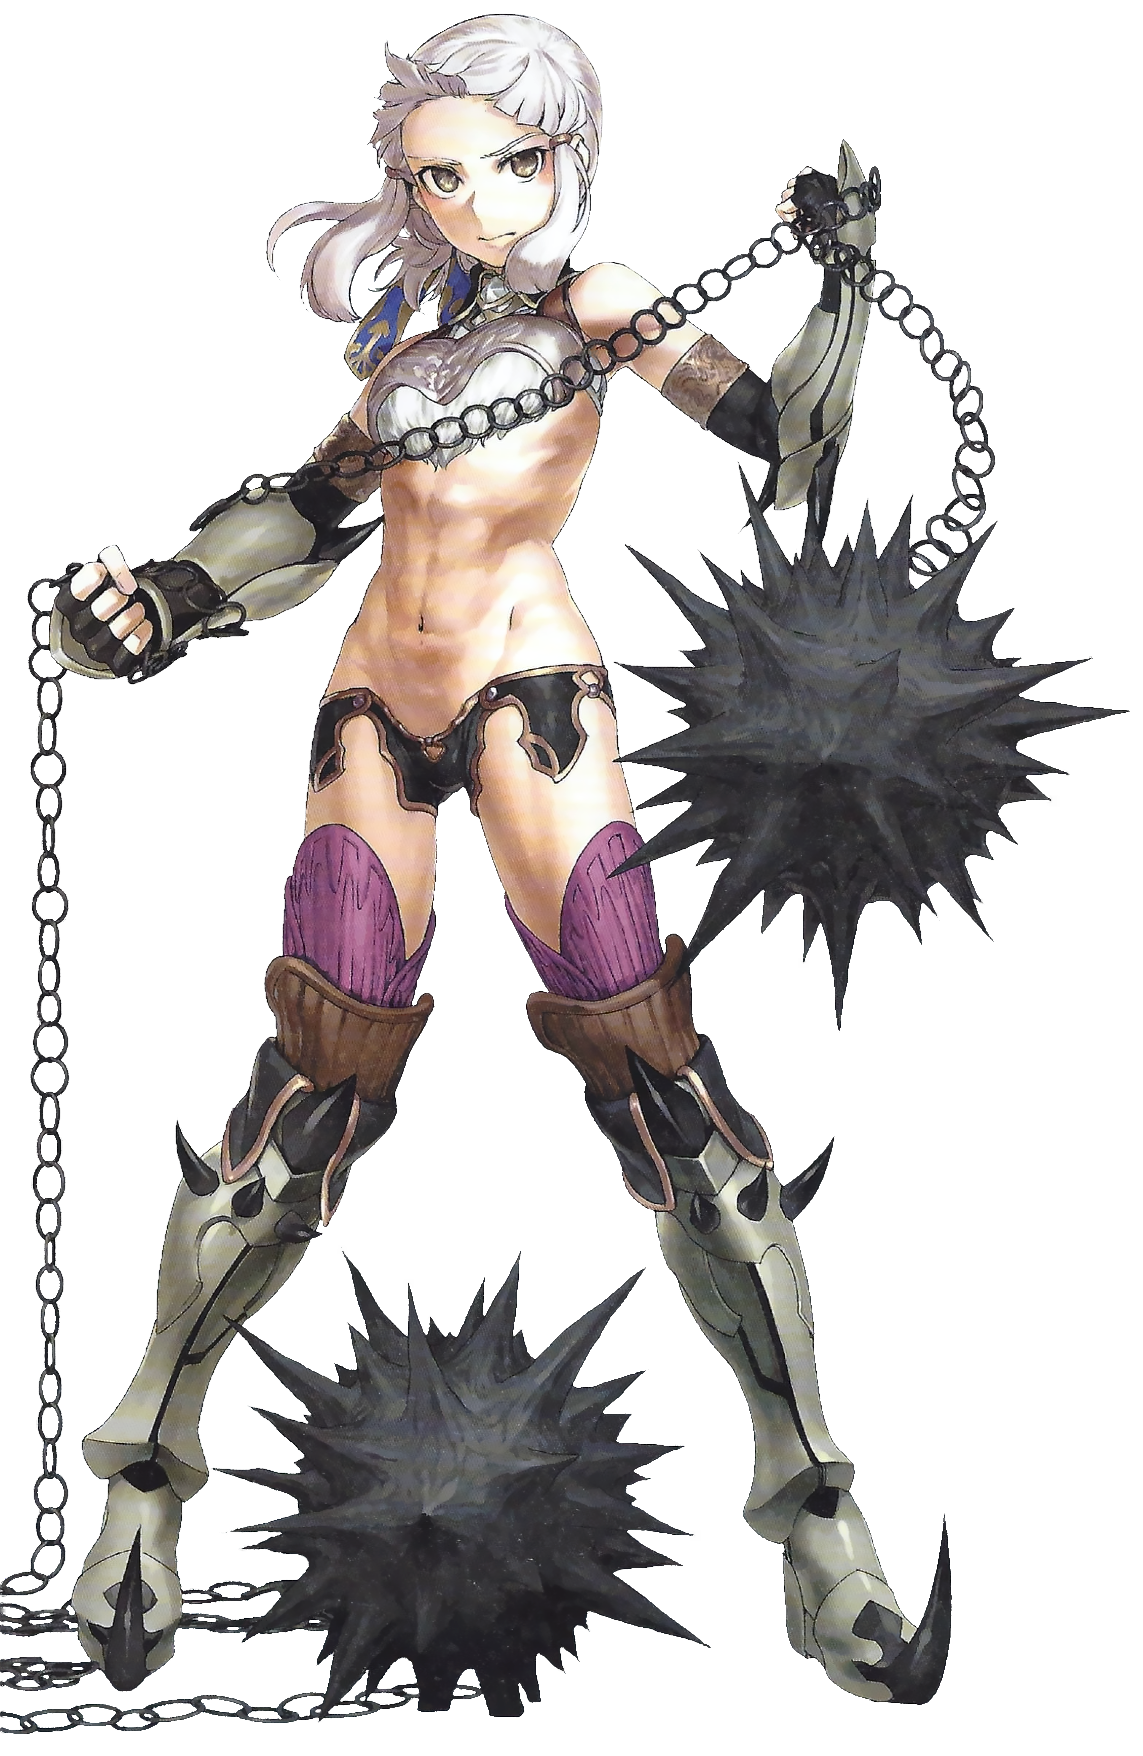 Berserker (Fate/Grand Order - Penthesilea)